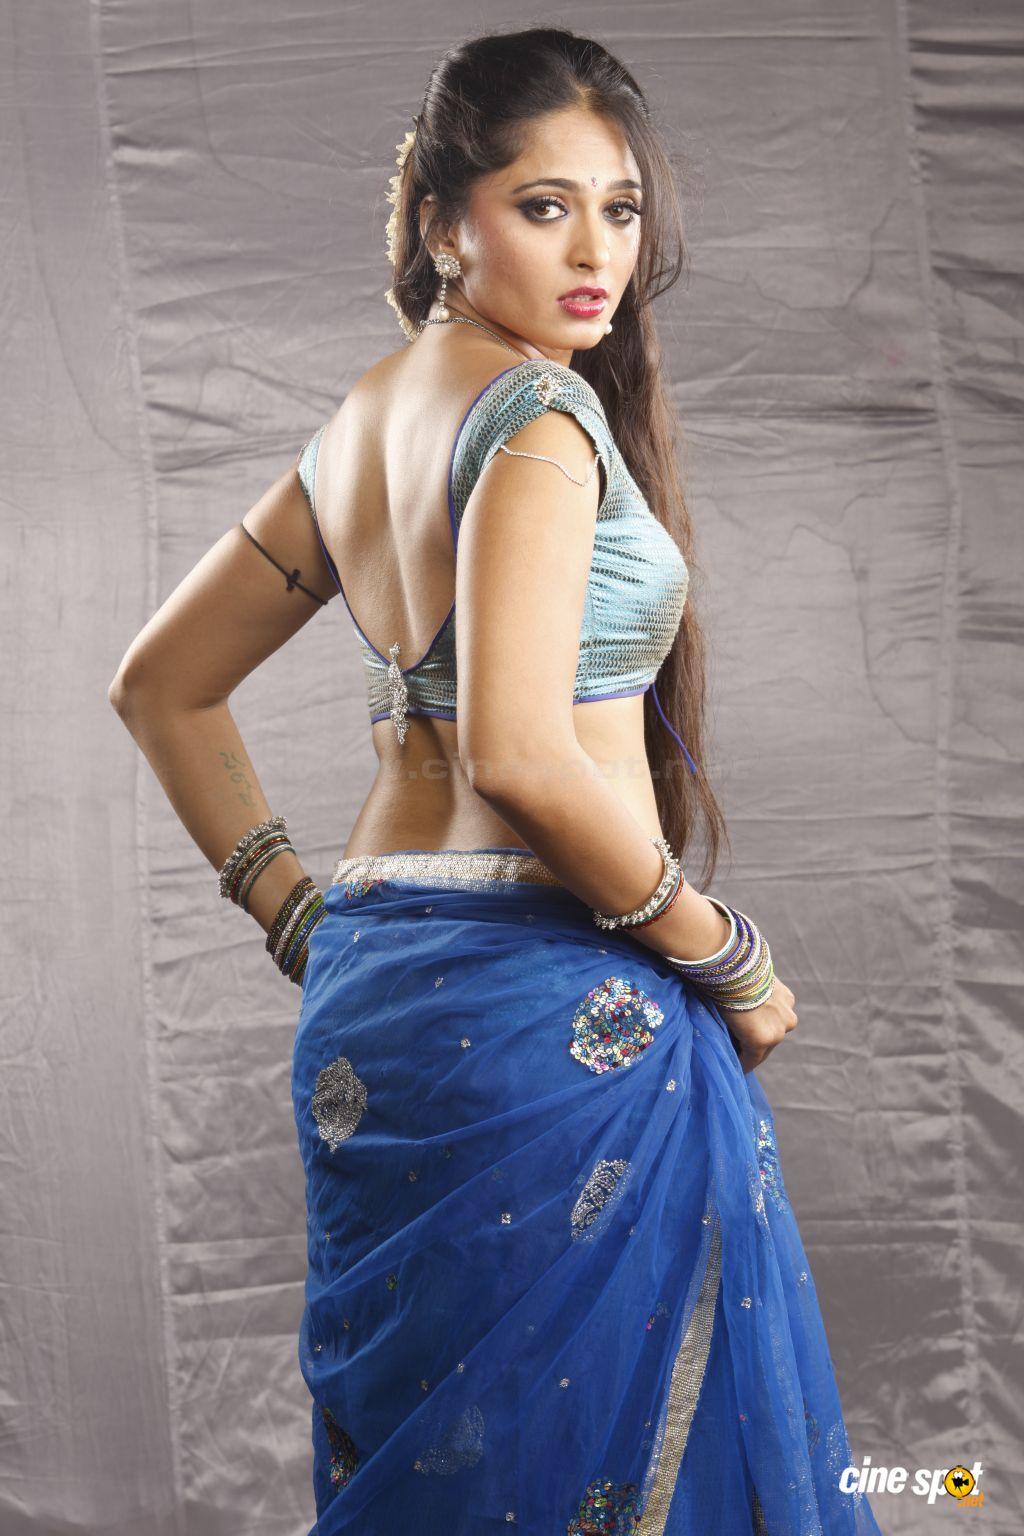 Sexy and hot Anushka Shetty killer look photos and images